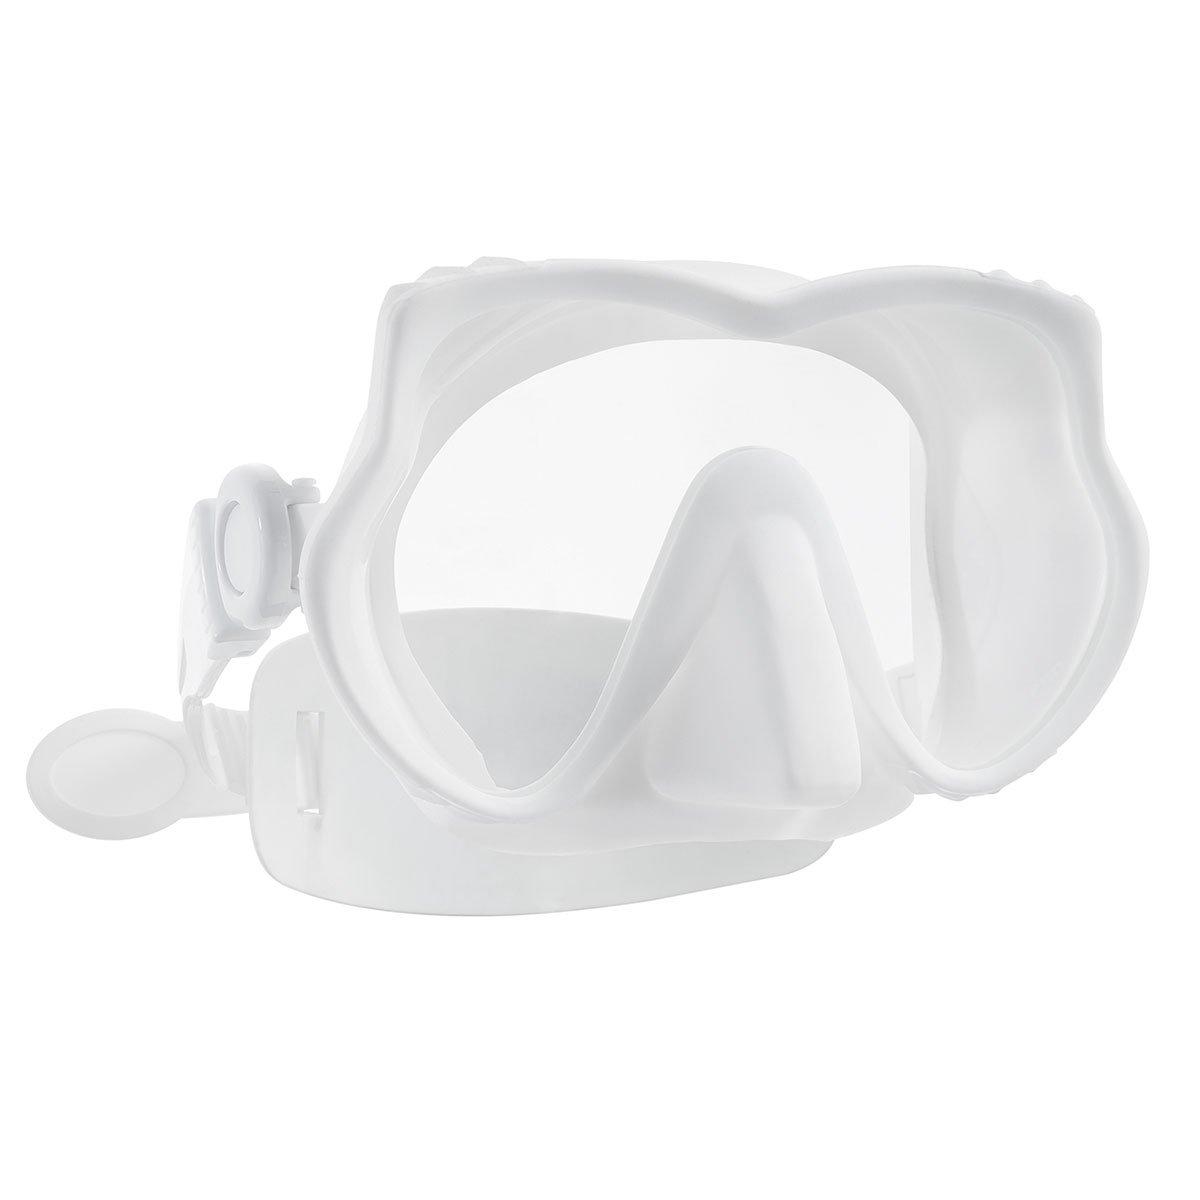 Scuba Pro Devil Dive Mask w/EZ strap